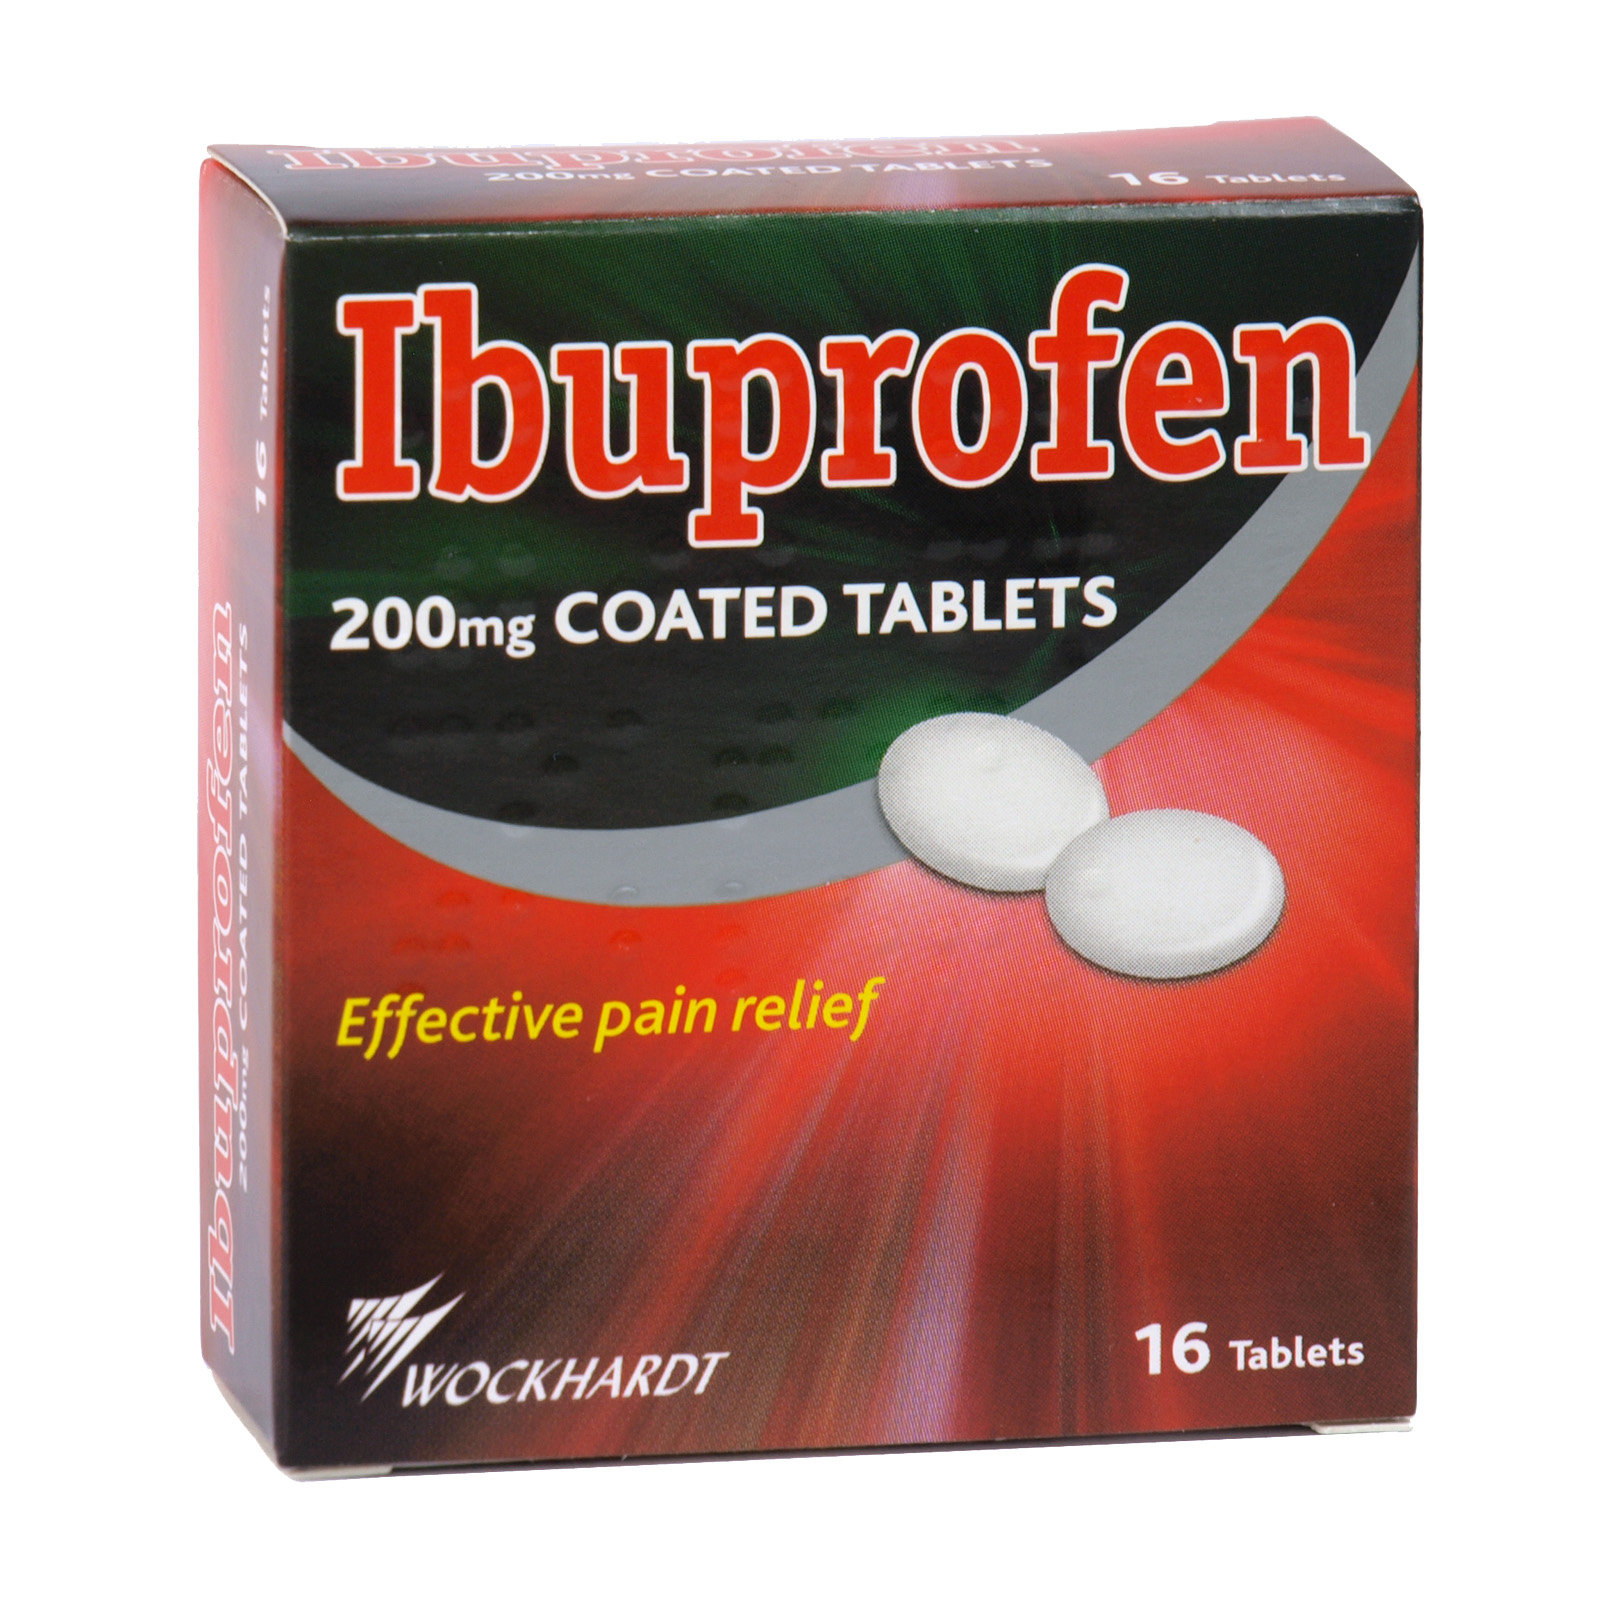 IBUPROFEN TABLETS 16X200MG X12 (NON RETURNABLE)